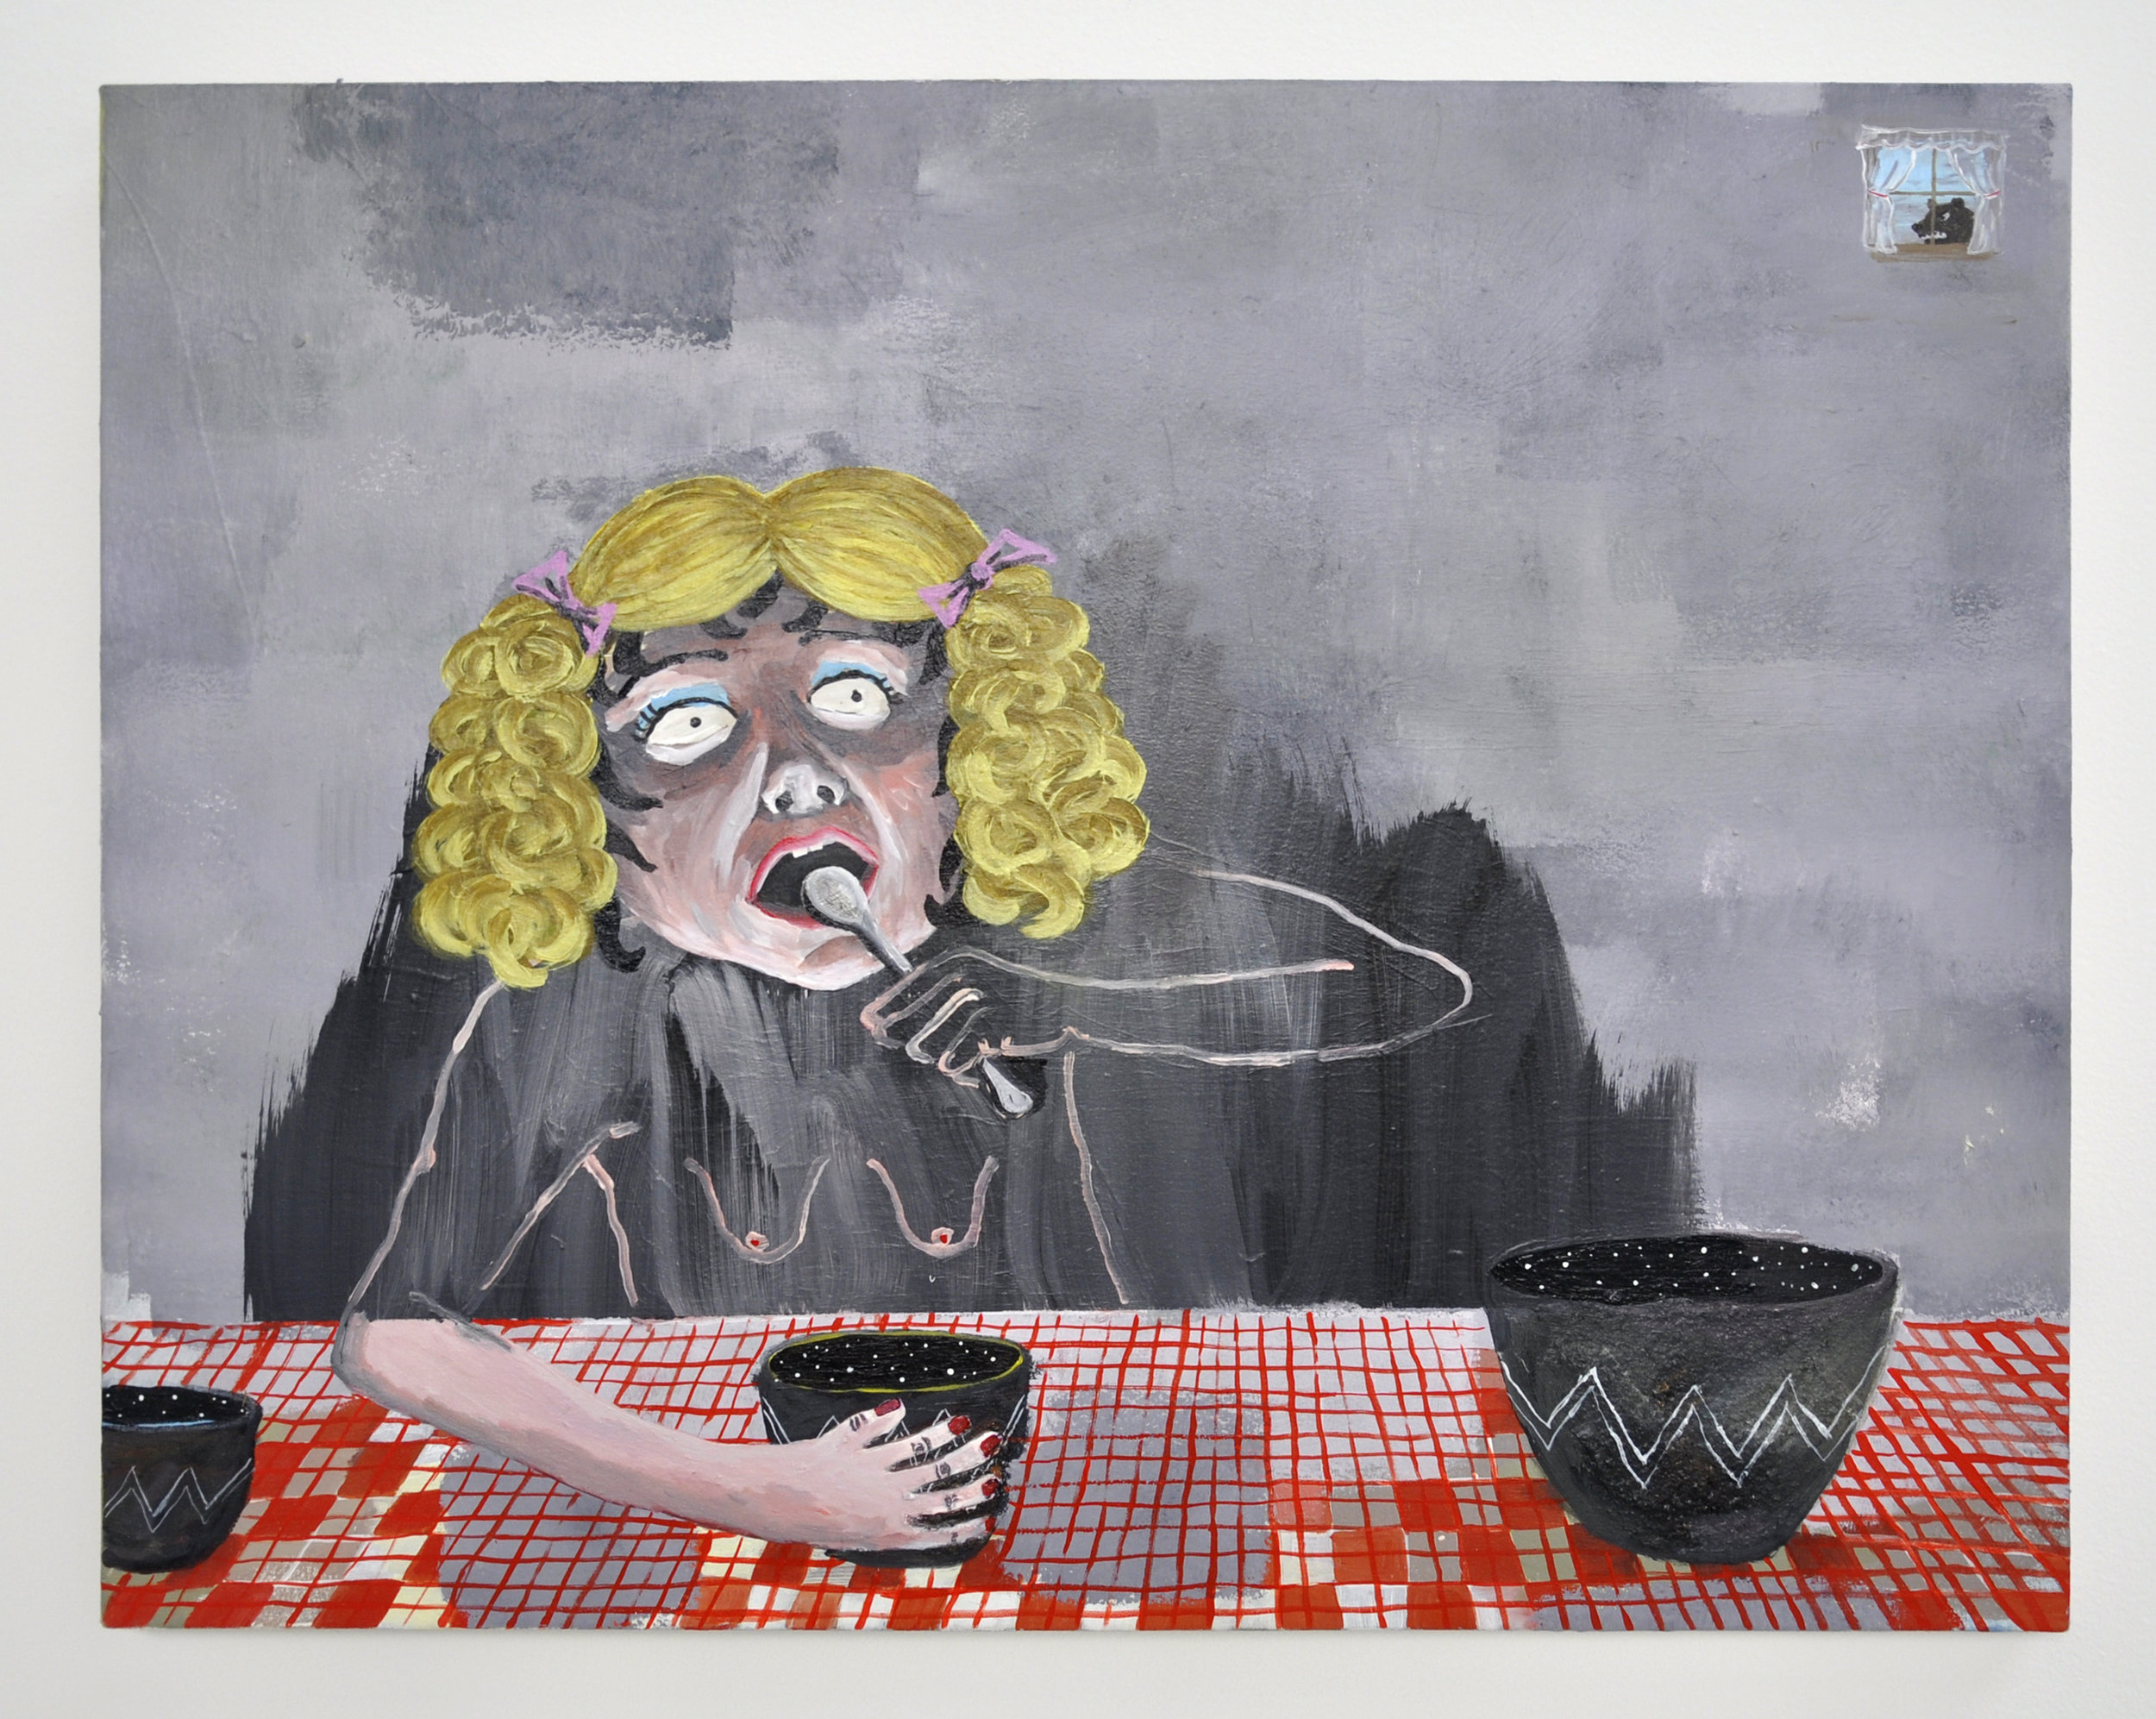 Cate White, Goldilocks, 28 x 36, acrylic, latex, glitter on canvas, 2019